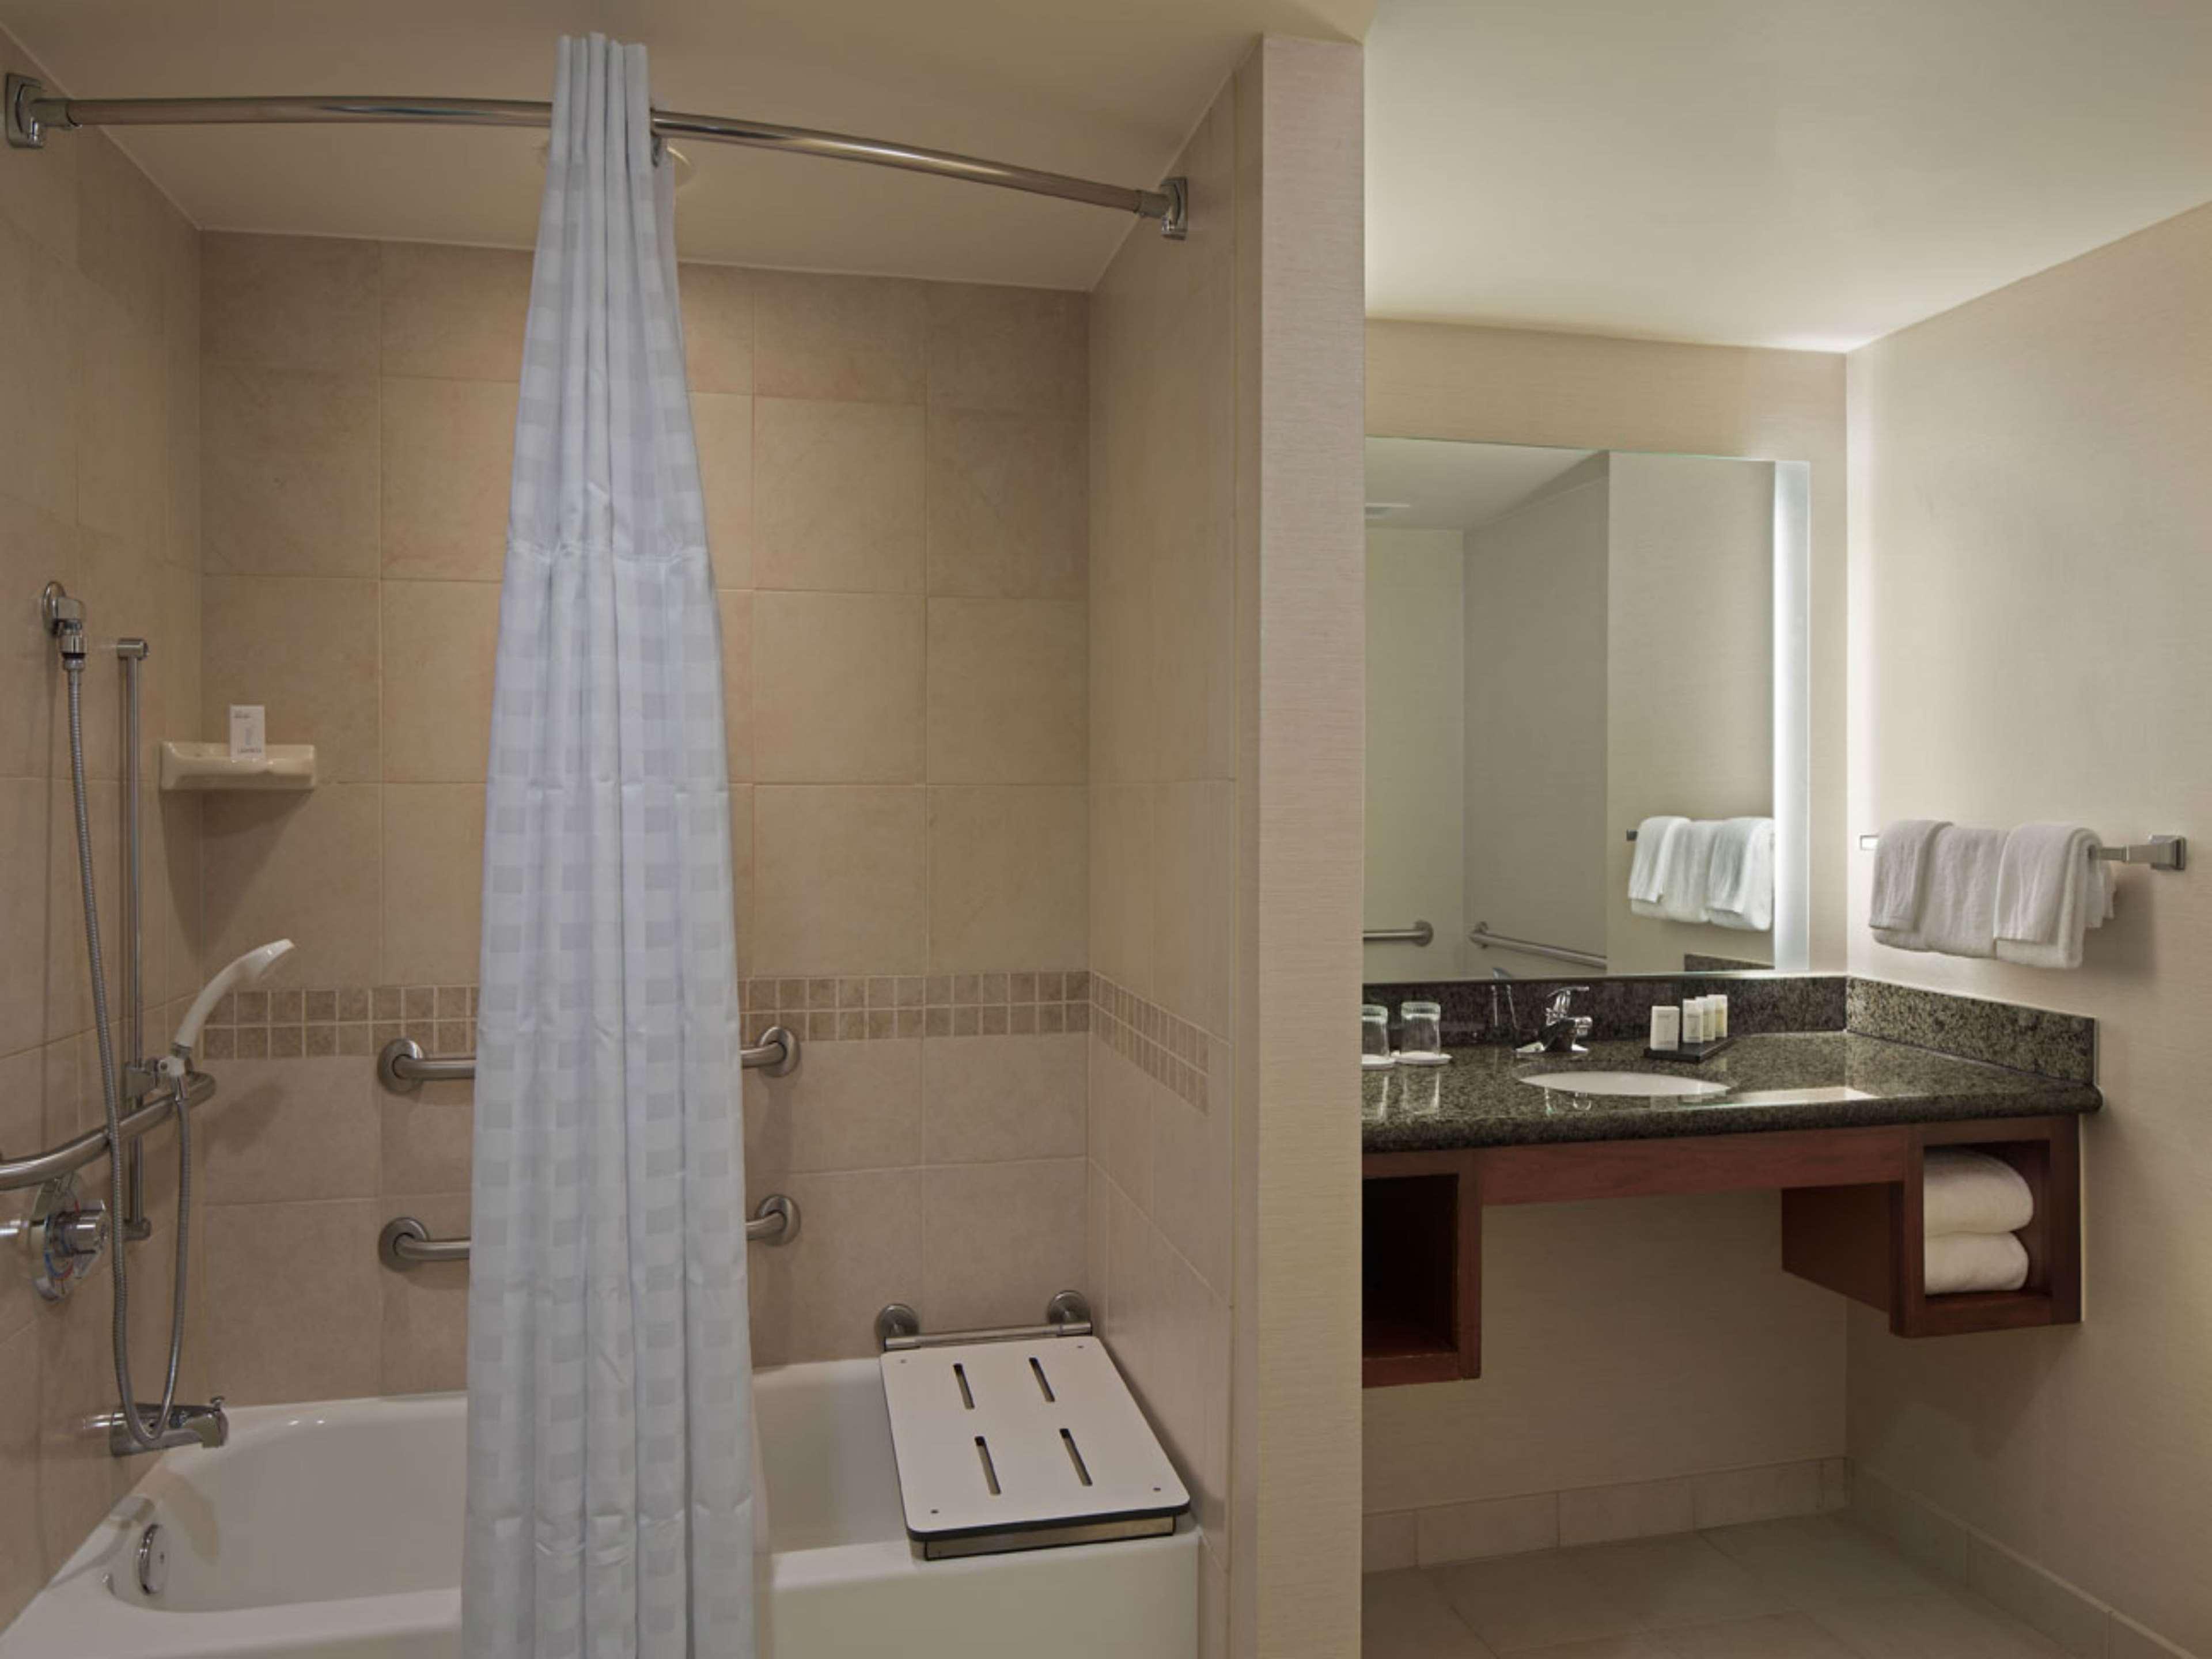 Embassy Suites by Hilton Winston Salem image 12